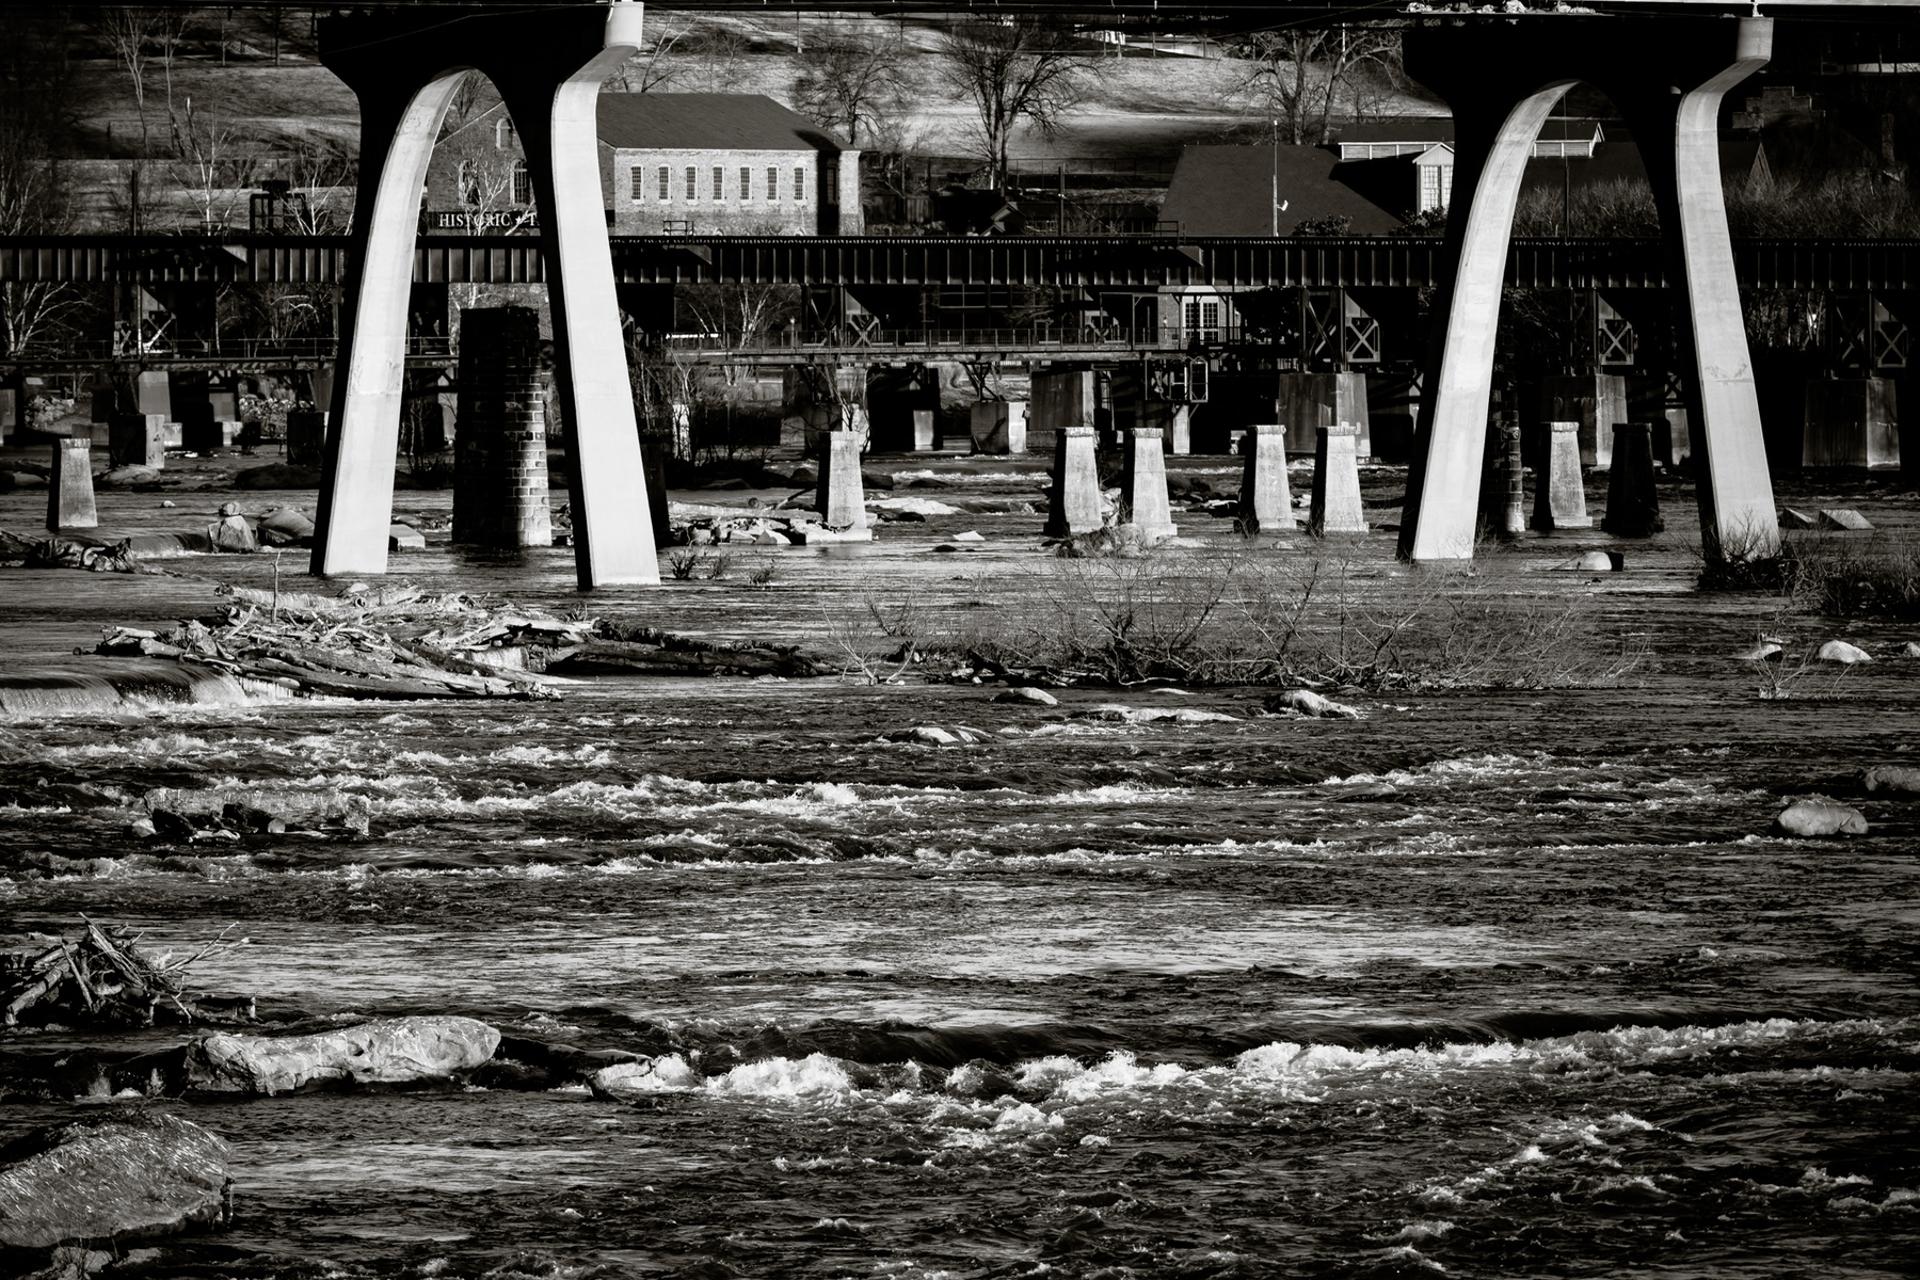 Historic Tredegar by Alex Nyerges